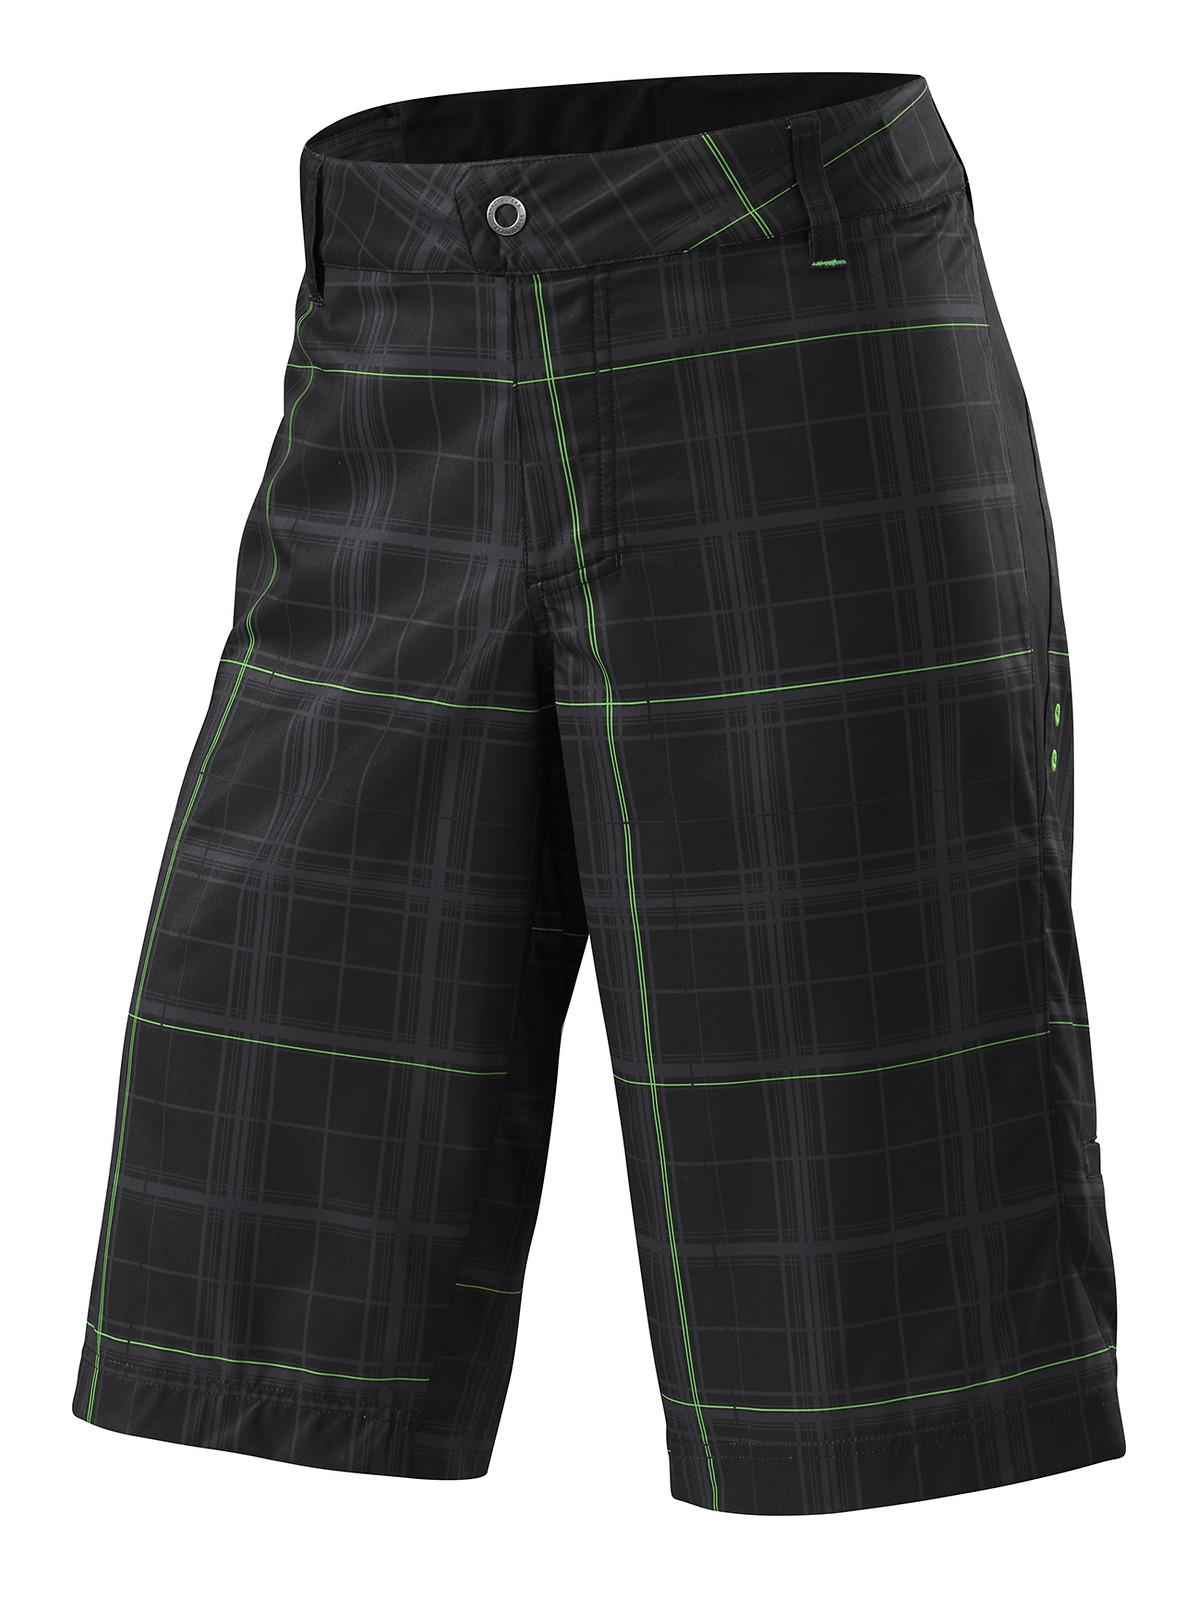 Specialized Enduro Sport Short - black plaid